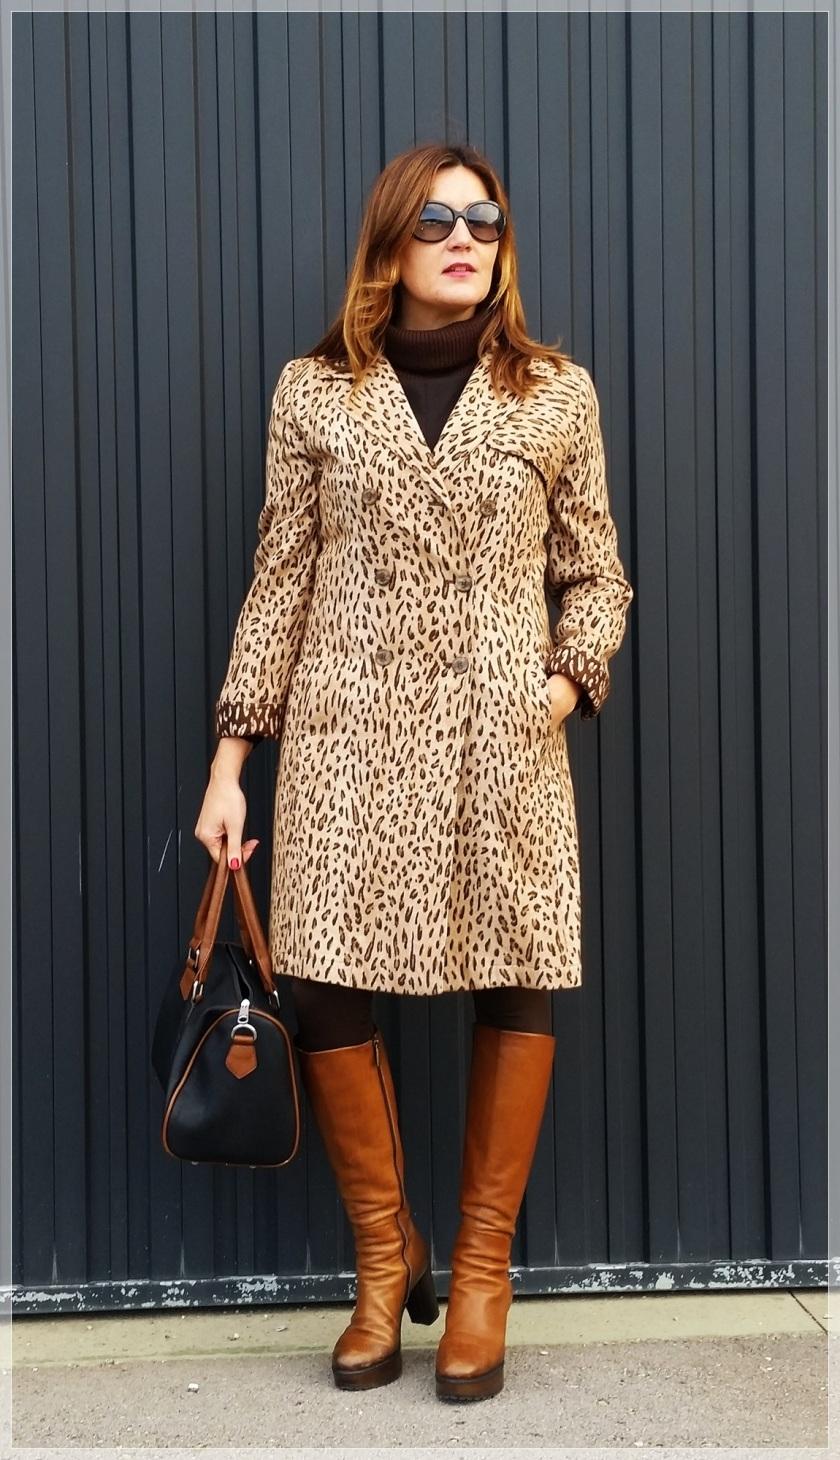 Cuida de ti, Cuida tu imagen, Looks de invierno, Working looks, street style, winter trends 4